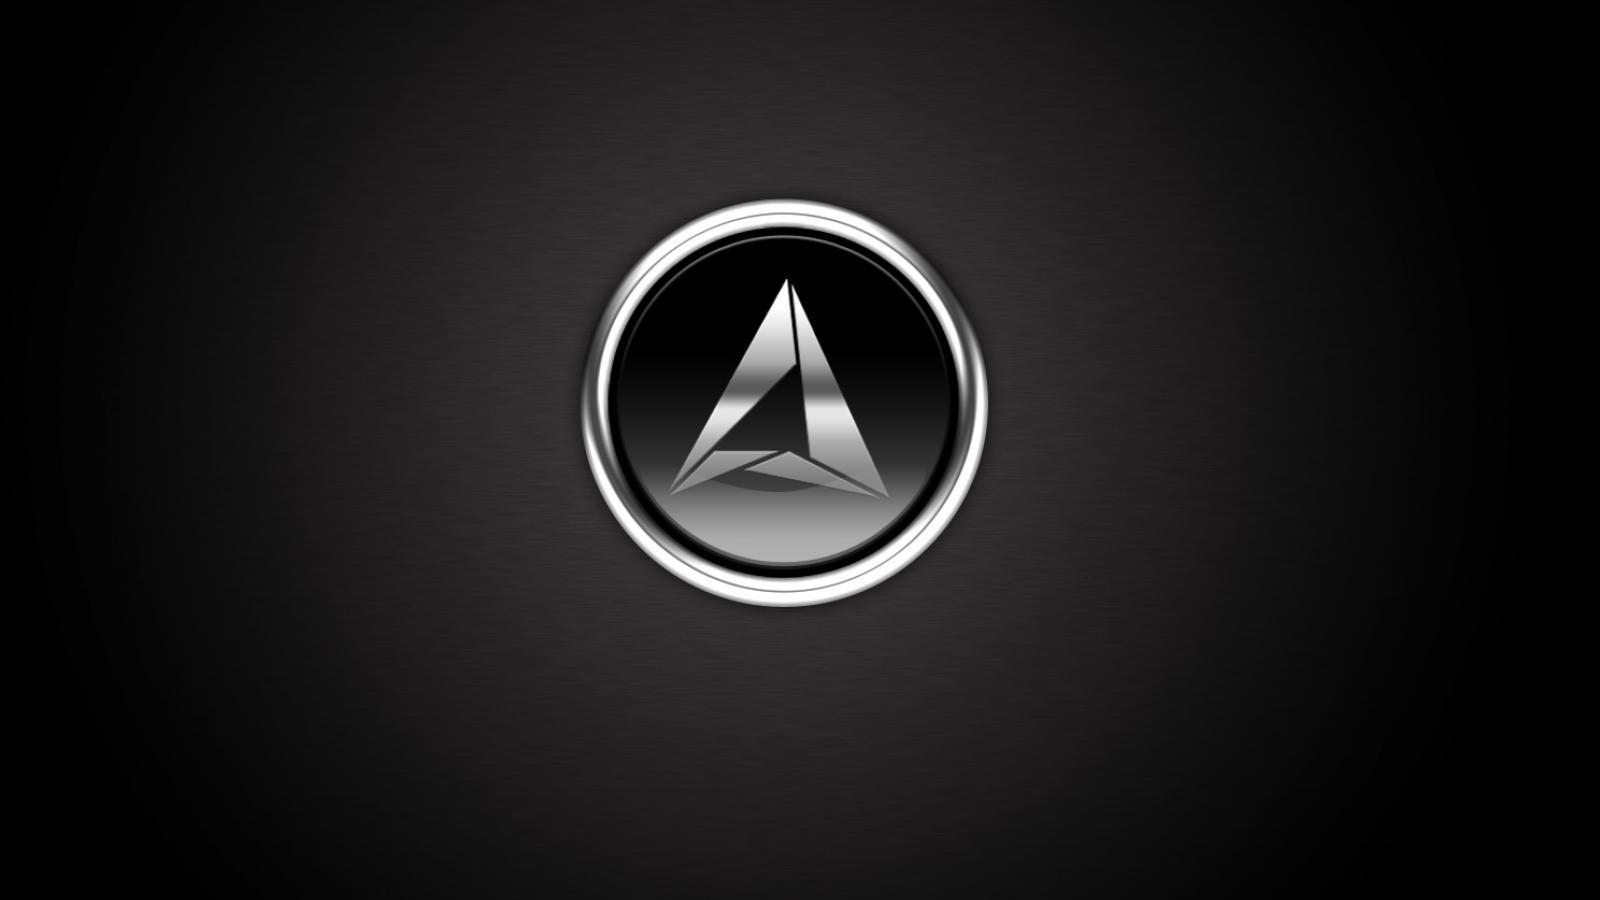 Stylish Metallic Button in Photoshop